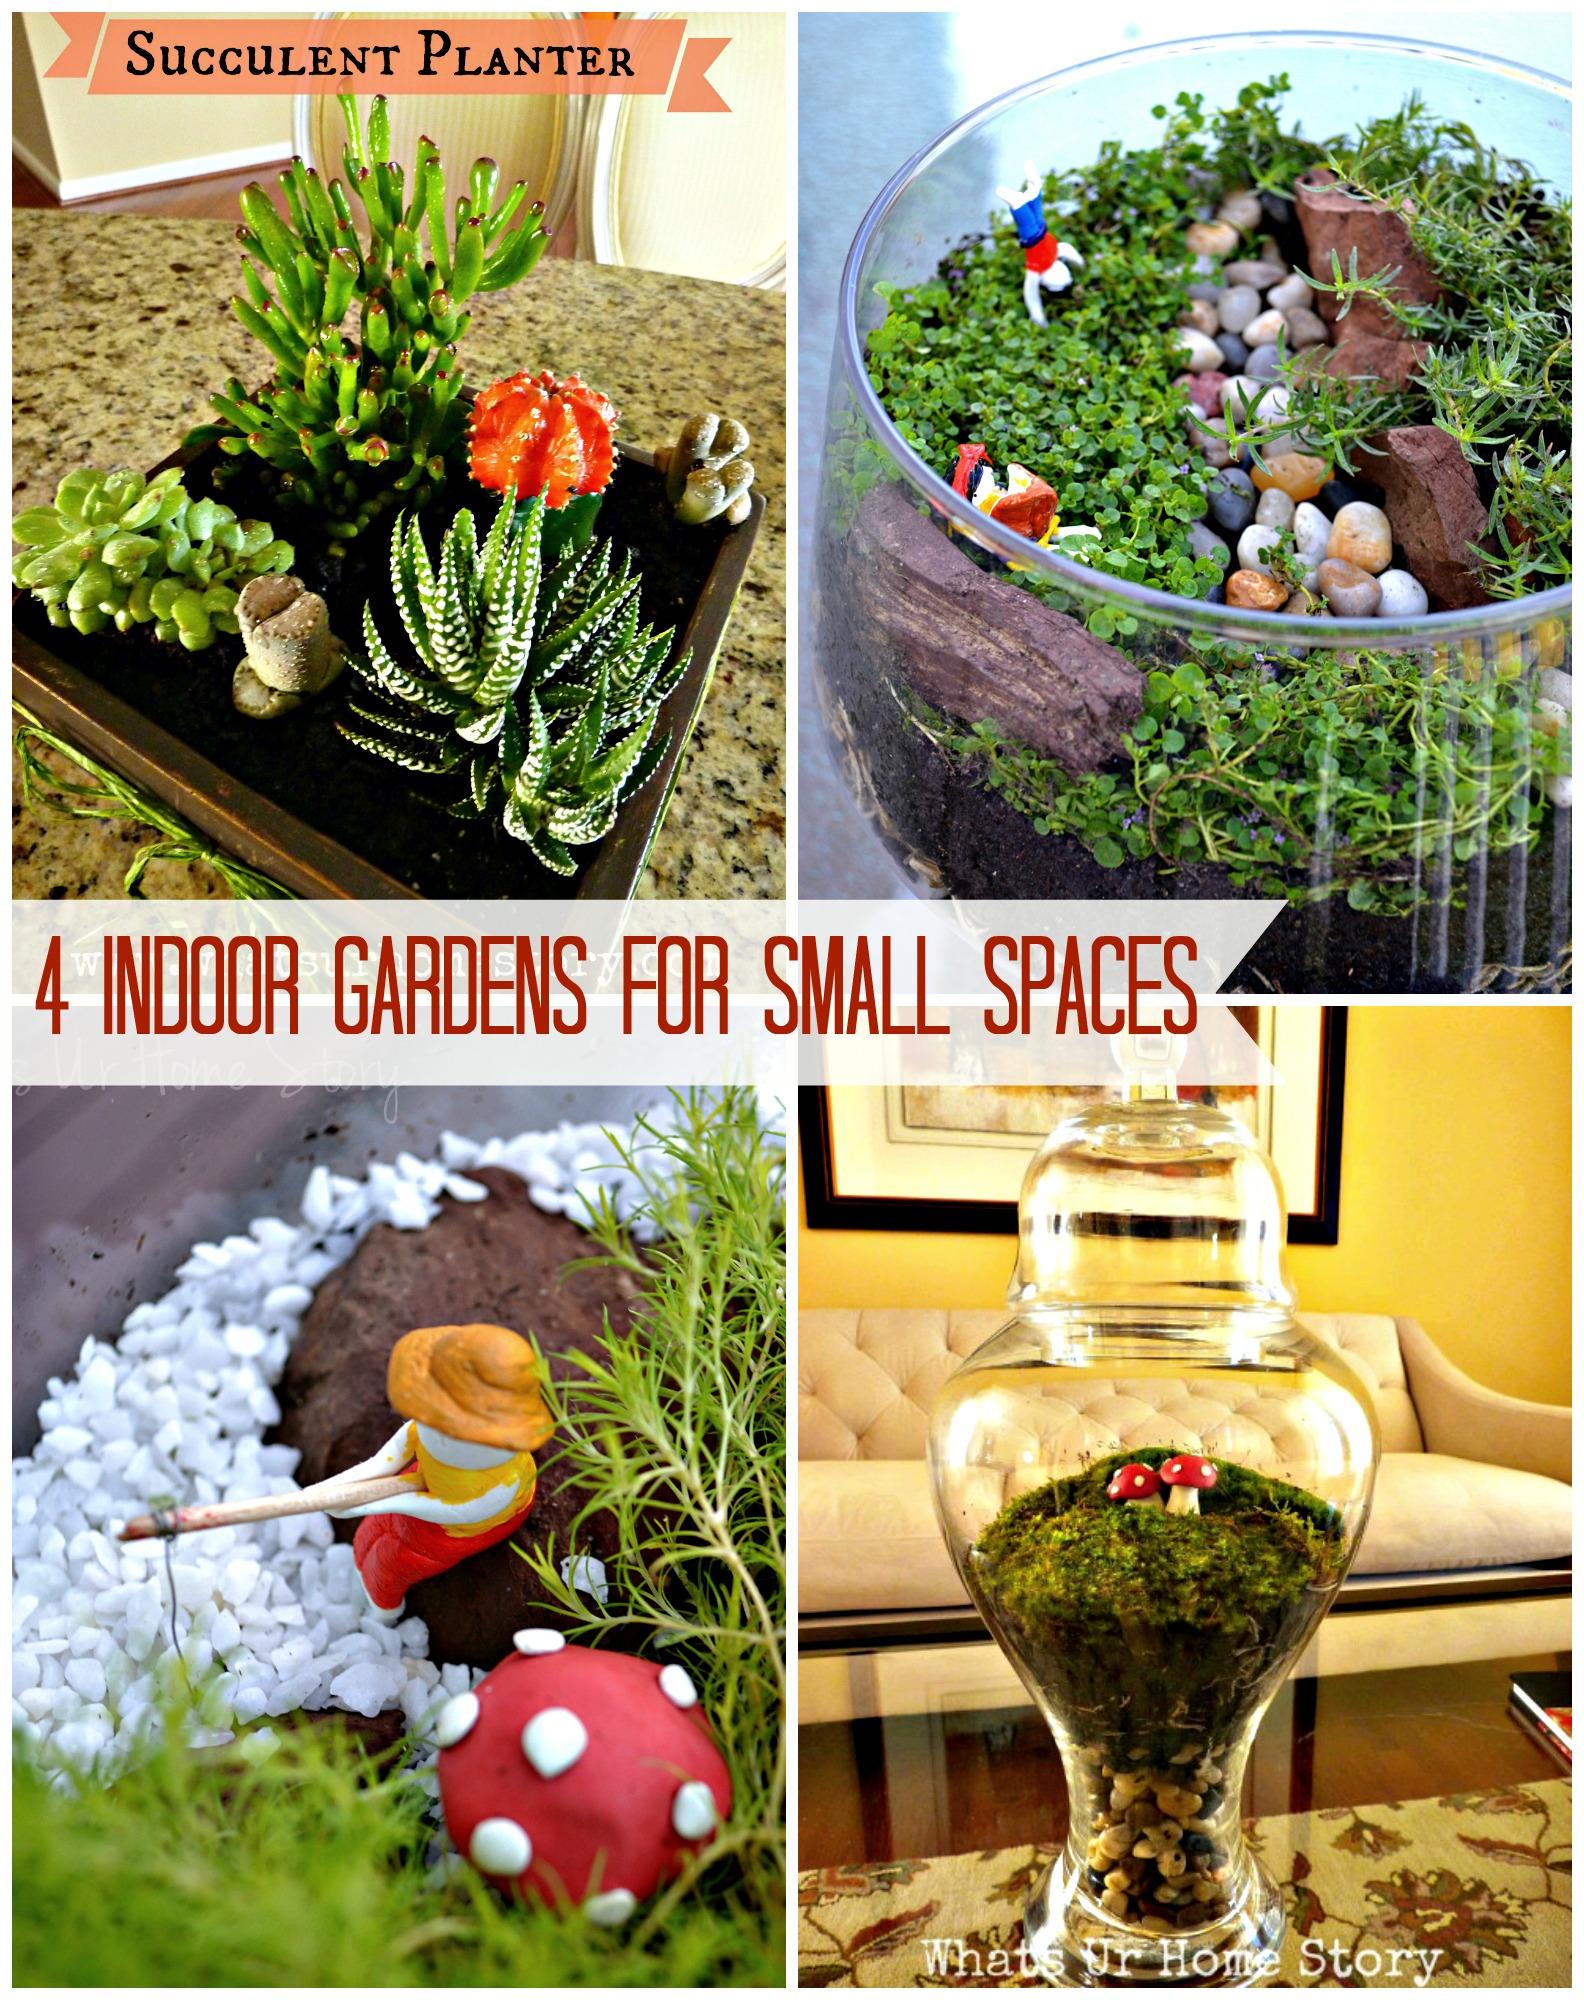 IndoorGardensforSmallSpaces